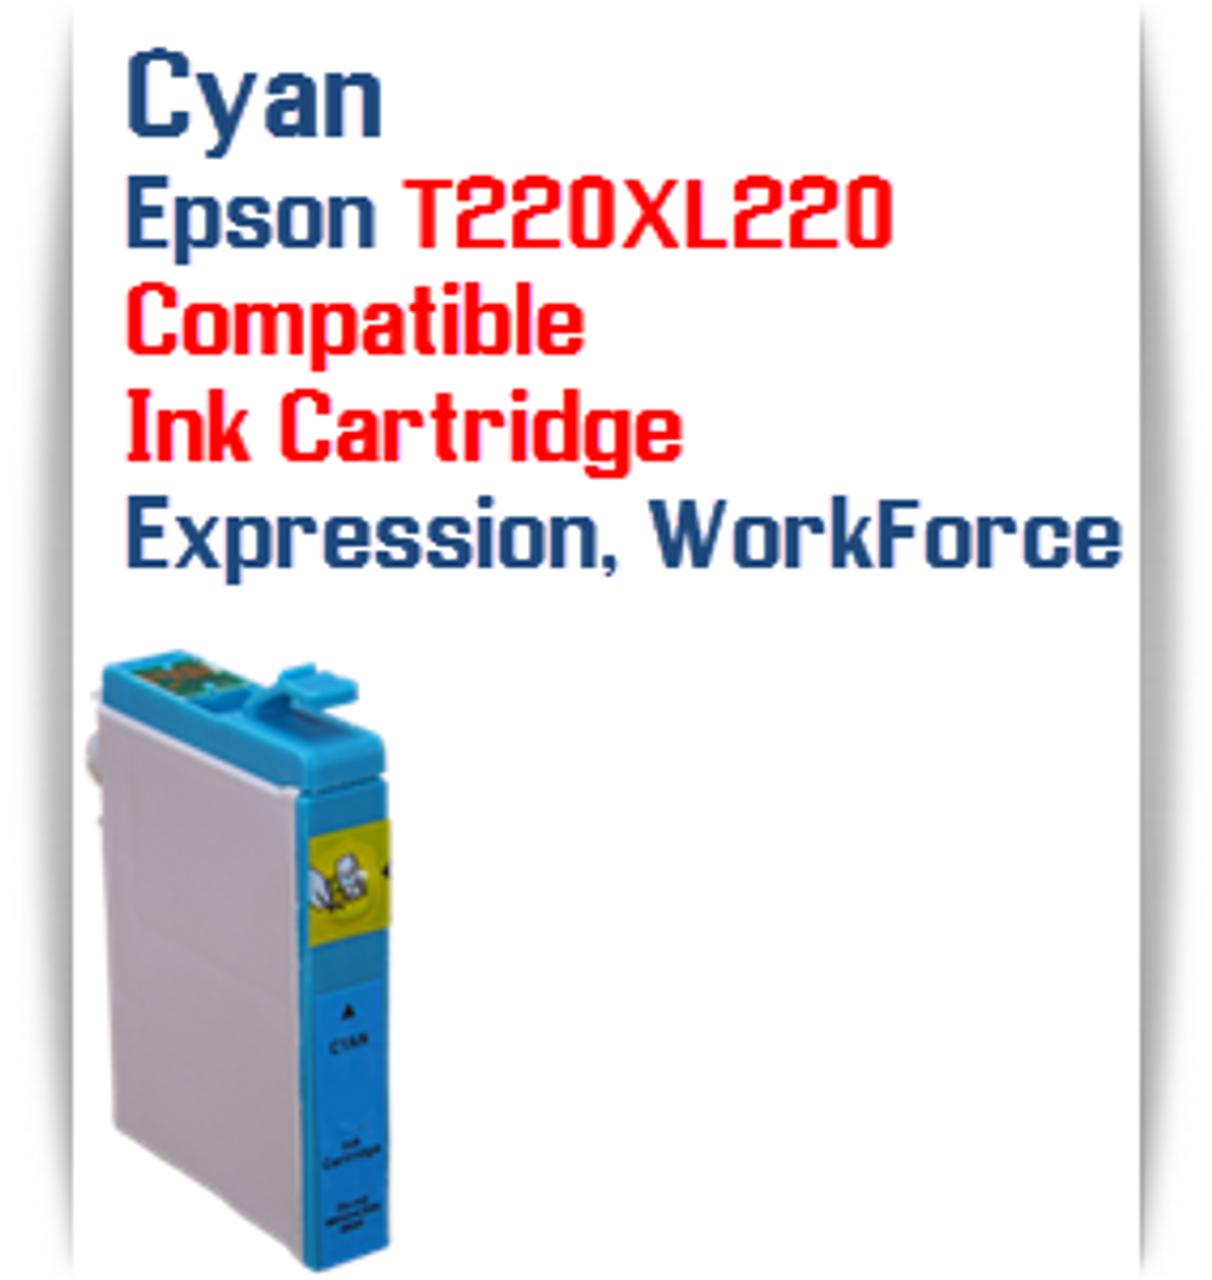 Cyan T220XL220 Epson Expression XP, WorkForce WF Compatible Printer Ink Cartridge  Epson Expression XP-320 Epson Expression XP-420 Epson Expression XP-424  Epson WorkForce WF-2630 Epson WorkForce WF-2650 Epson WorkForce WF-2660 Epson WorkForce WF-2750 Epson WorkForce WF-2760